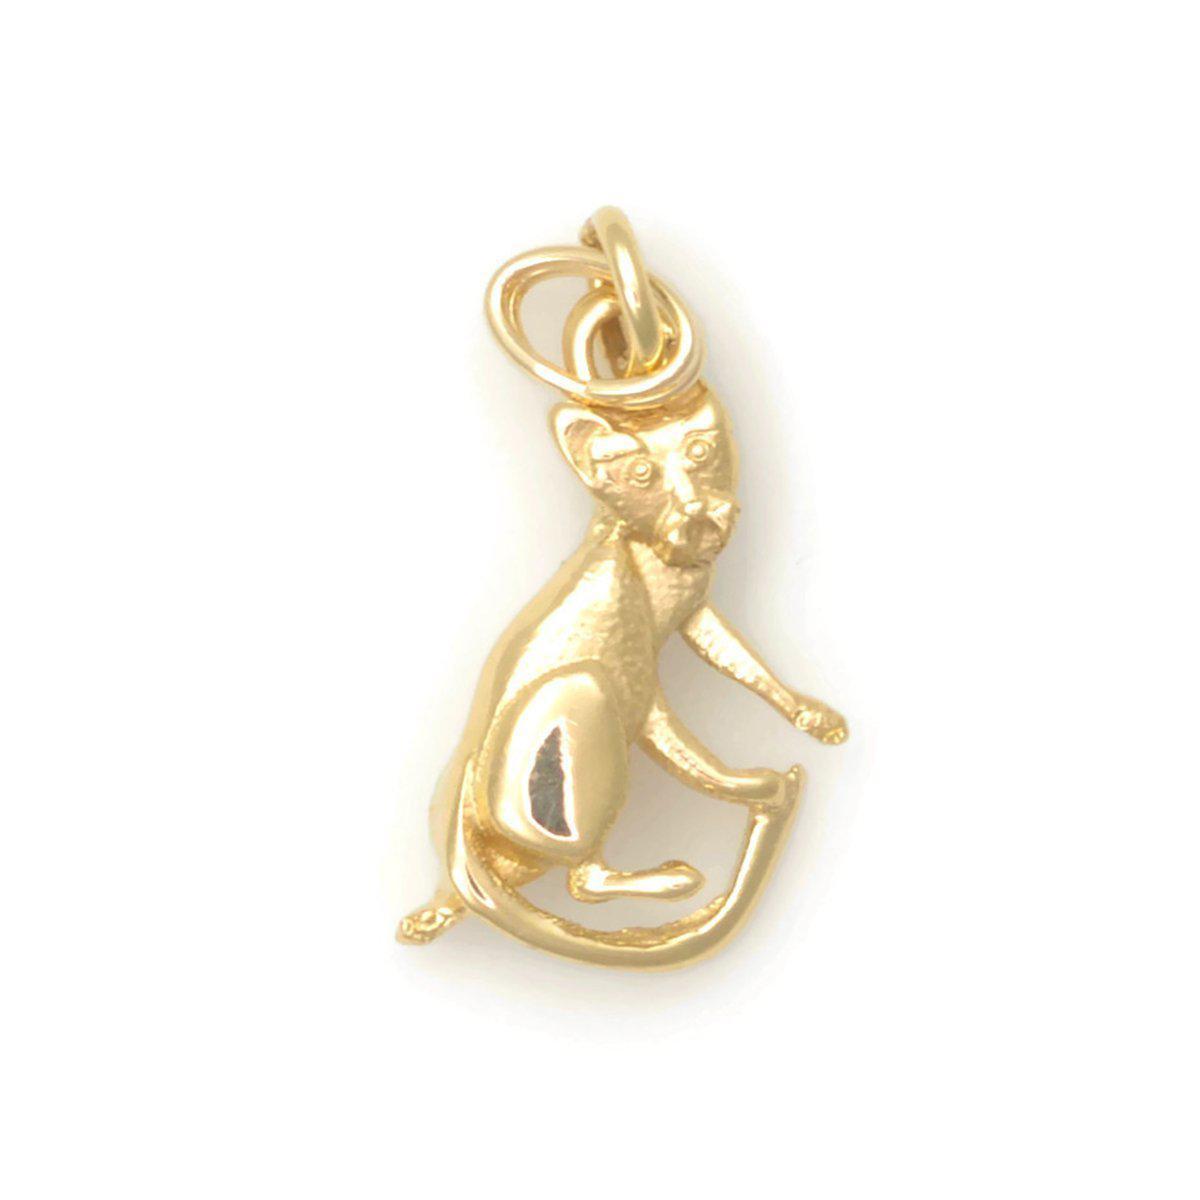 Donna Pizarro Designs 14kt Yellow Gold Playful Cat Charm cPLXzN